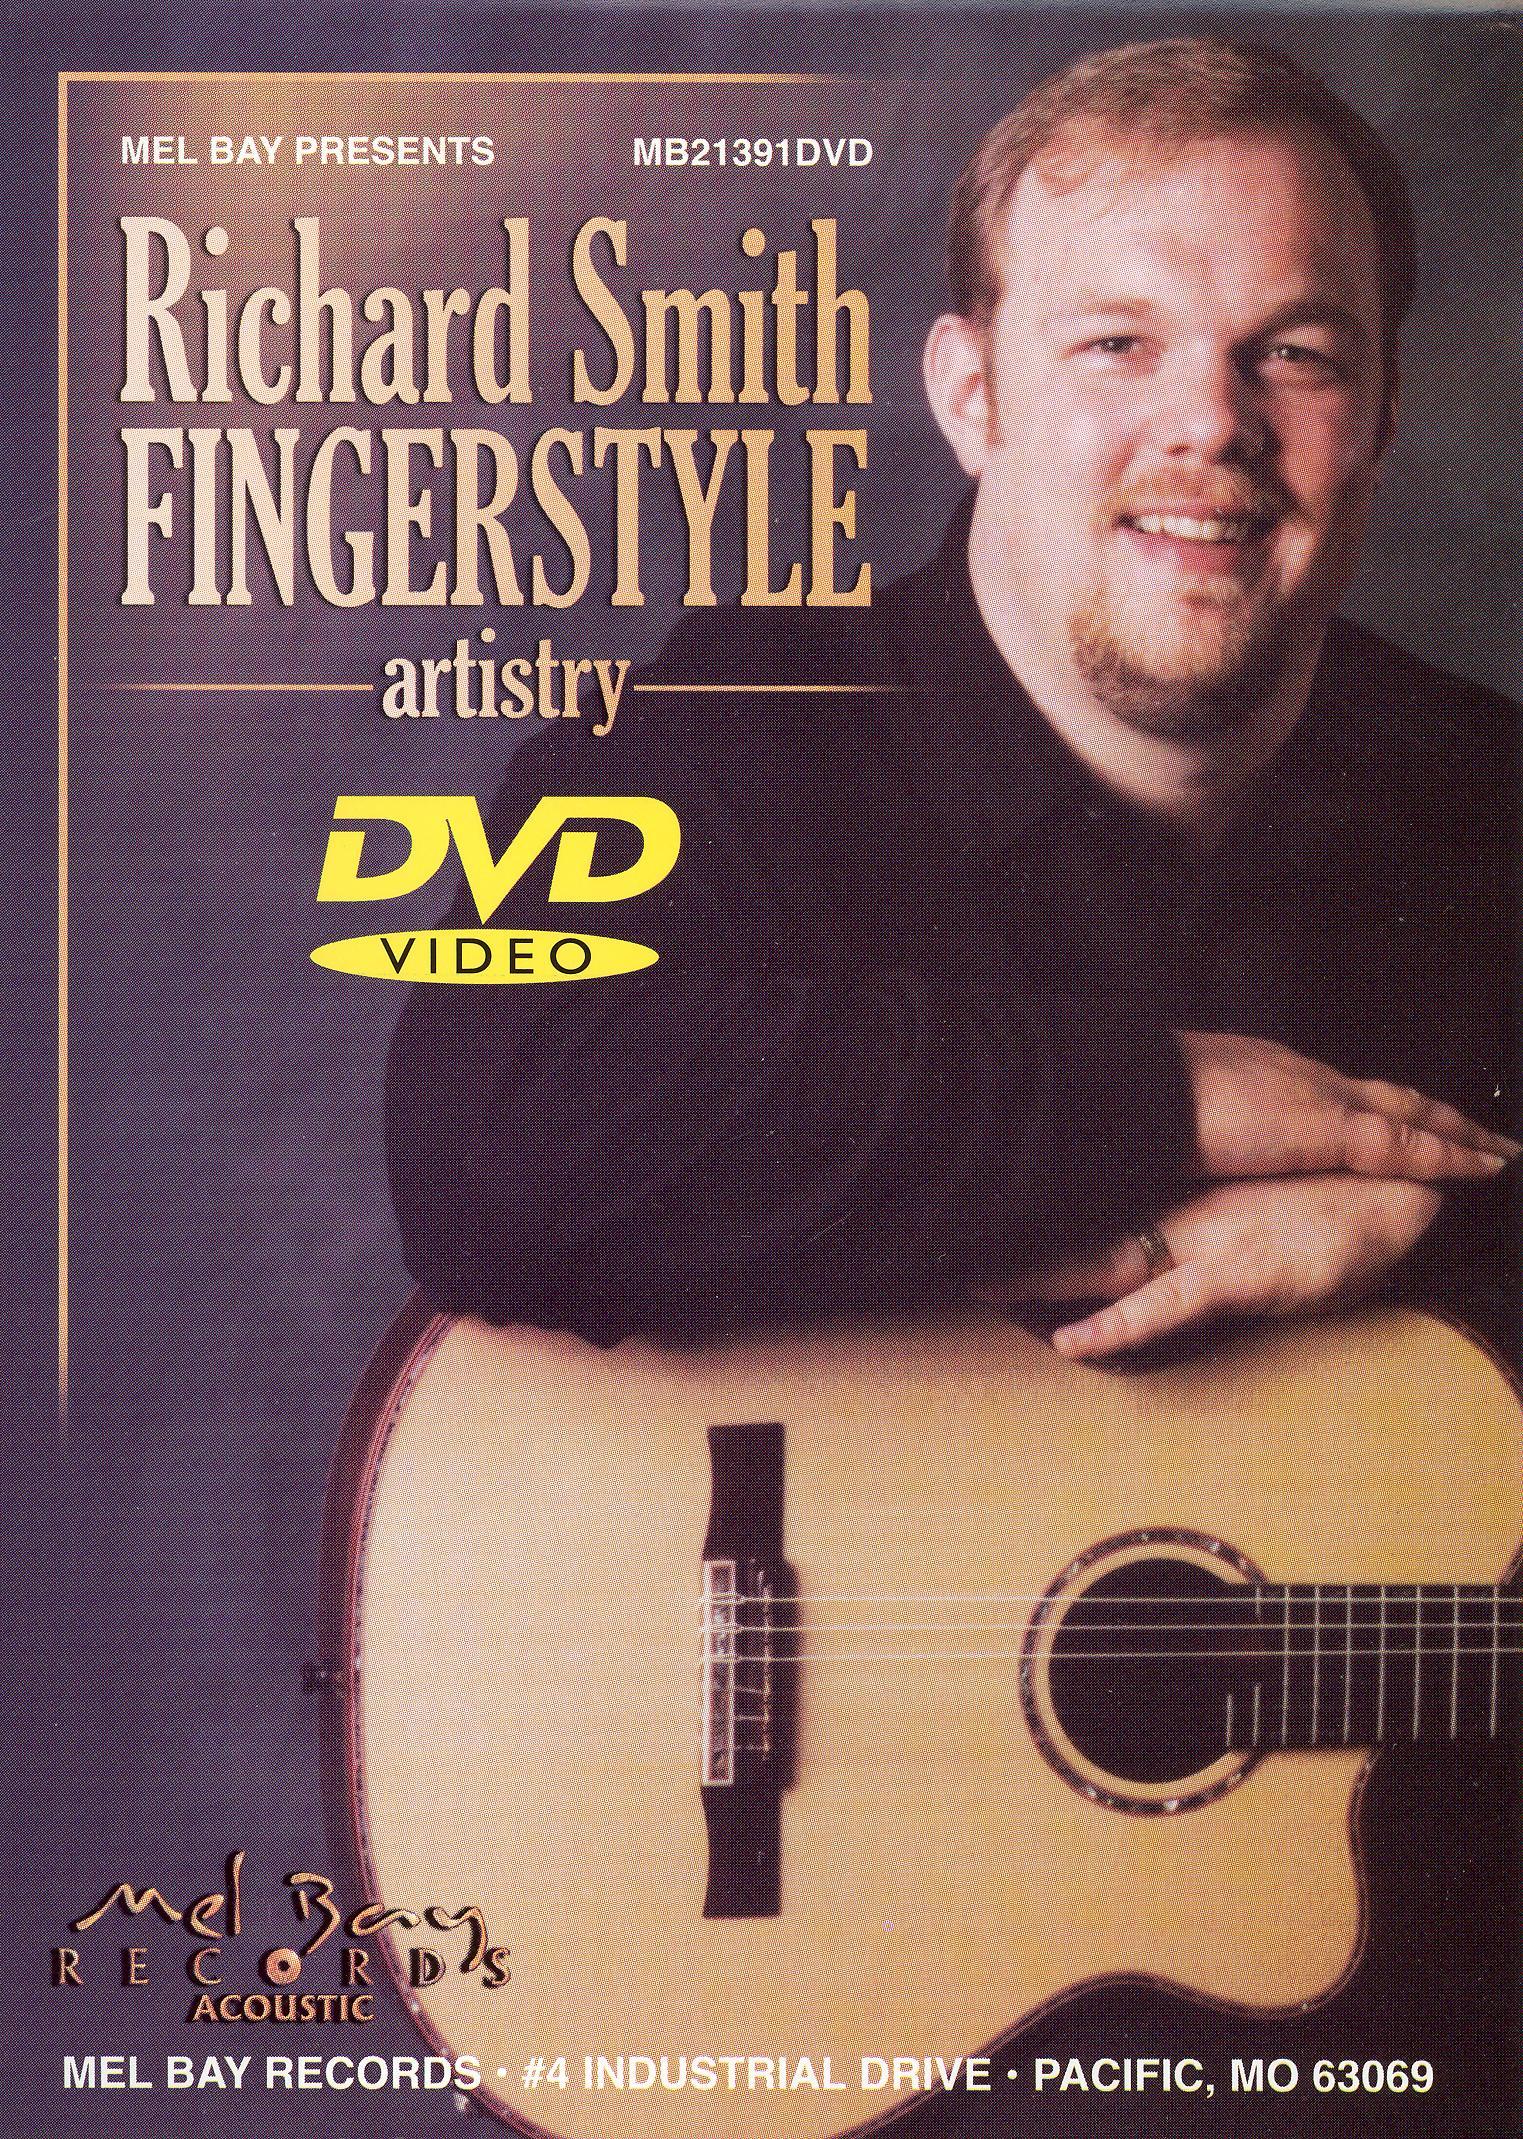 Richard Smith: Fingerstyle Artistry